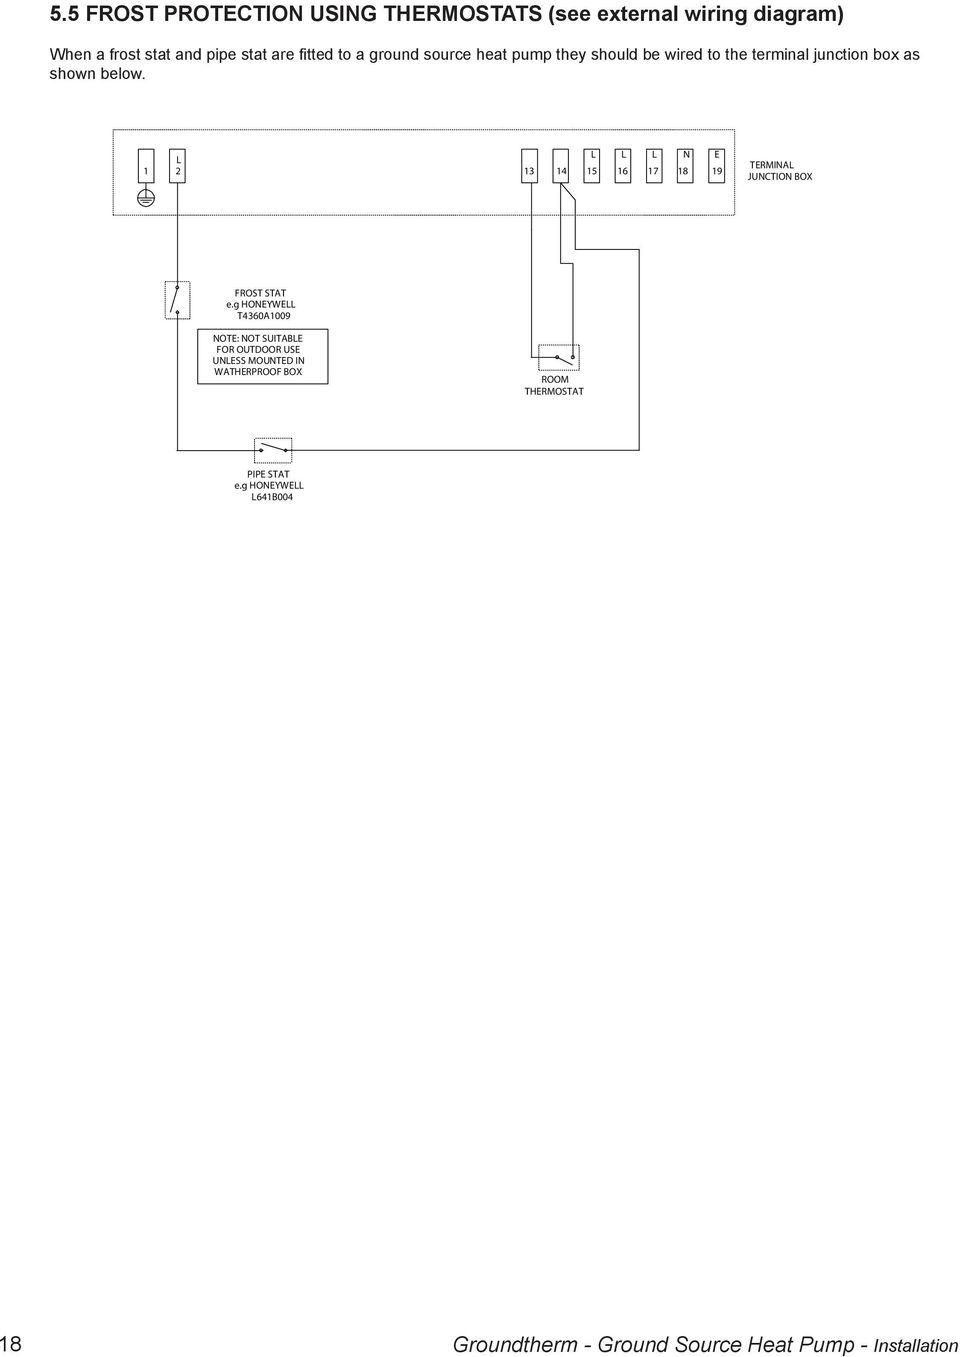 medium resolution of  ground source heat pump installation n e 1 2 13 14 15 16 17 18 19 termina junction box frost stat e